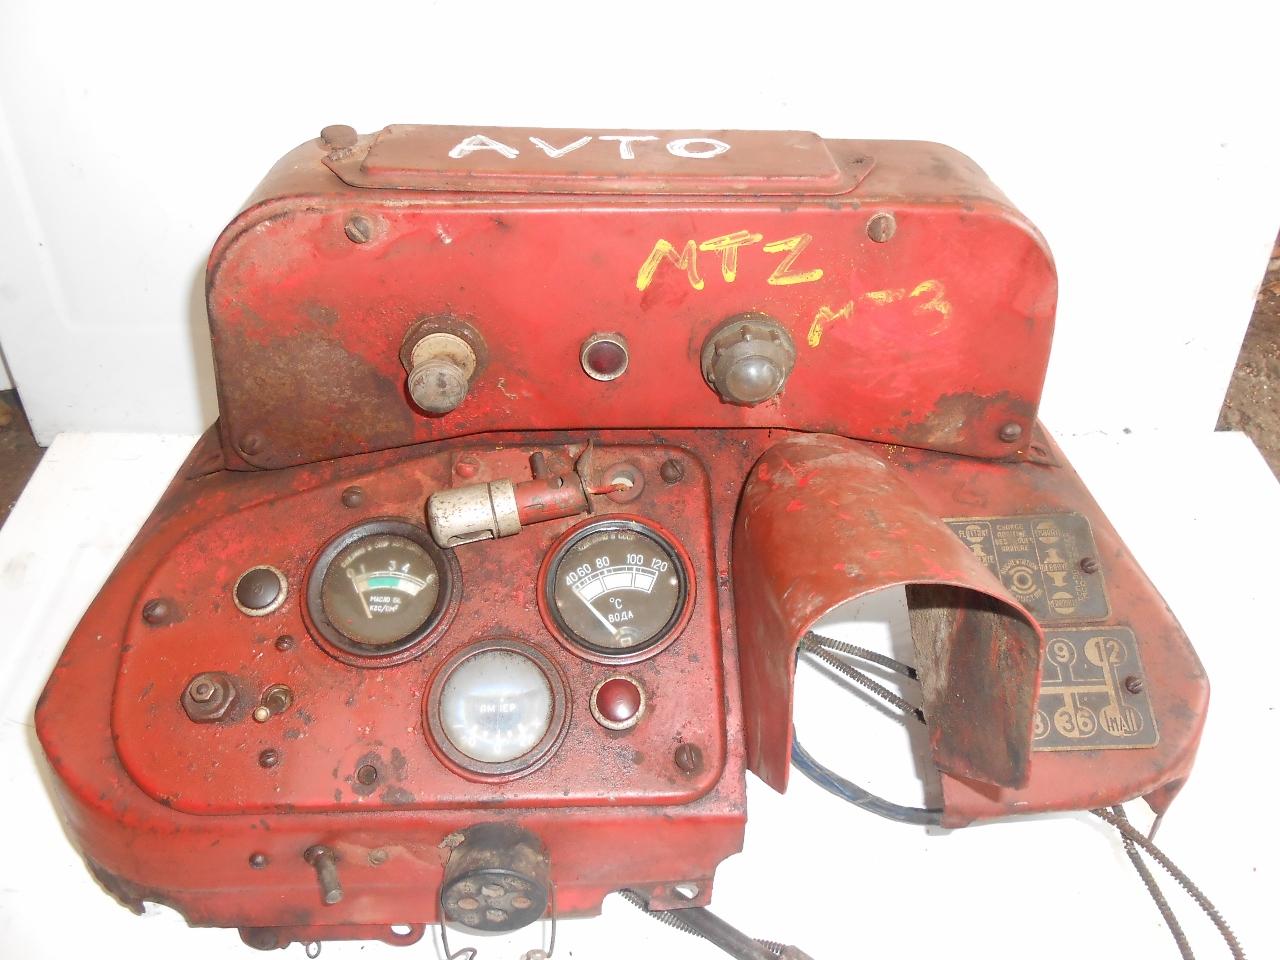 tableau de bord tracteur avto belarus mtz 50 52